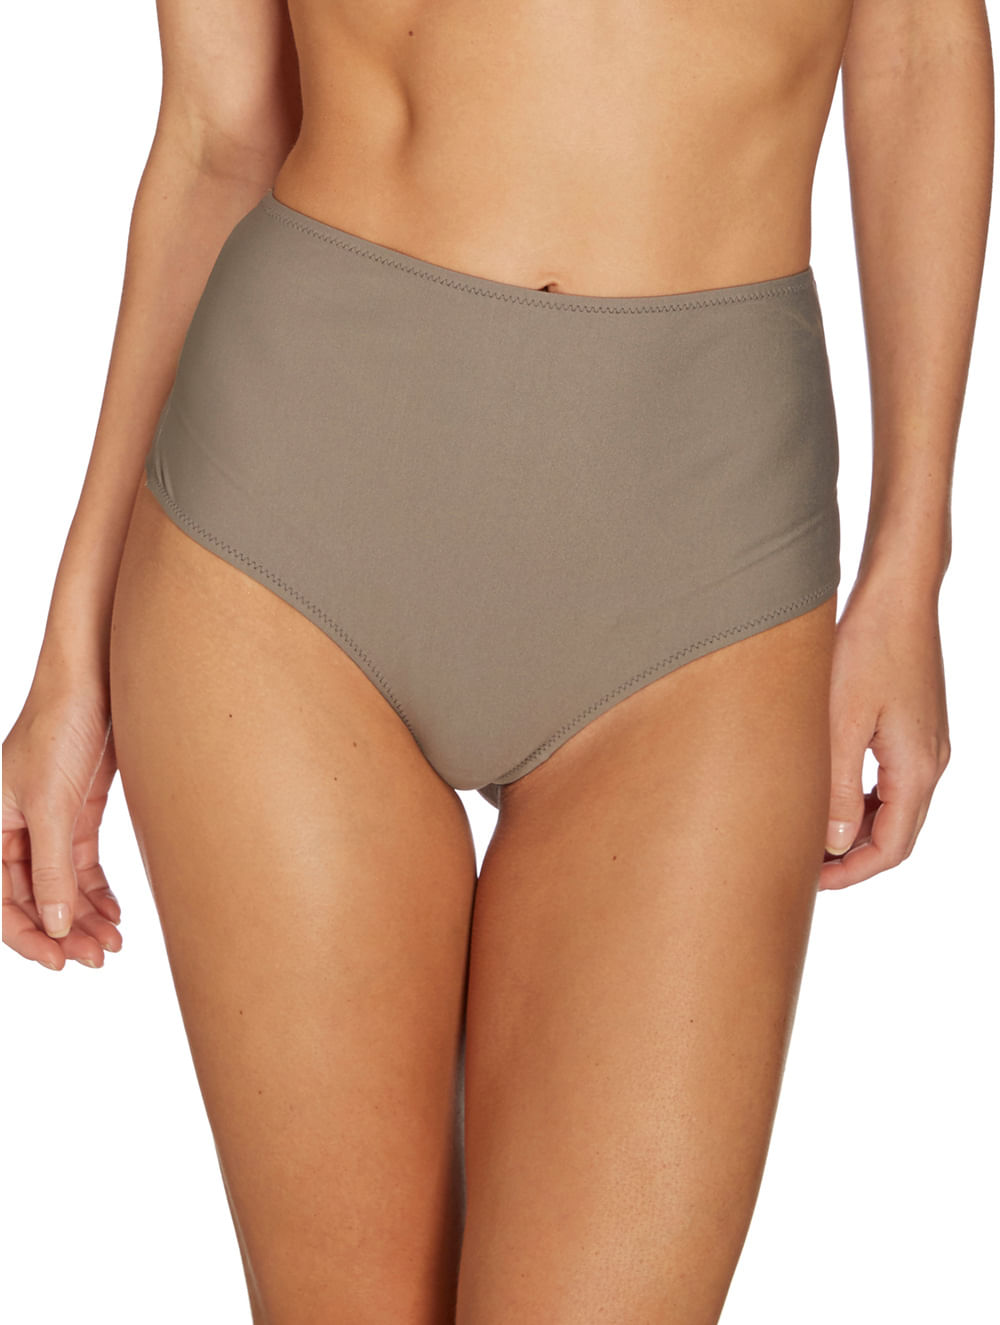 07086d615 Calcinha Cintura Alta Hot Pant All Purpose - Valisere